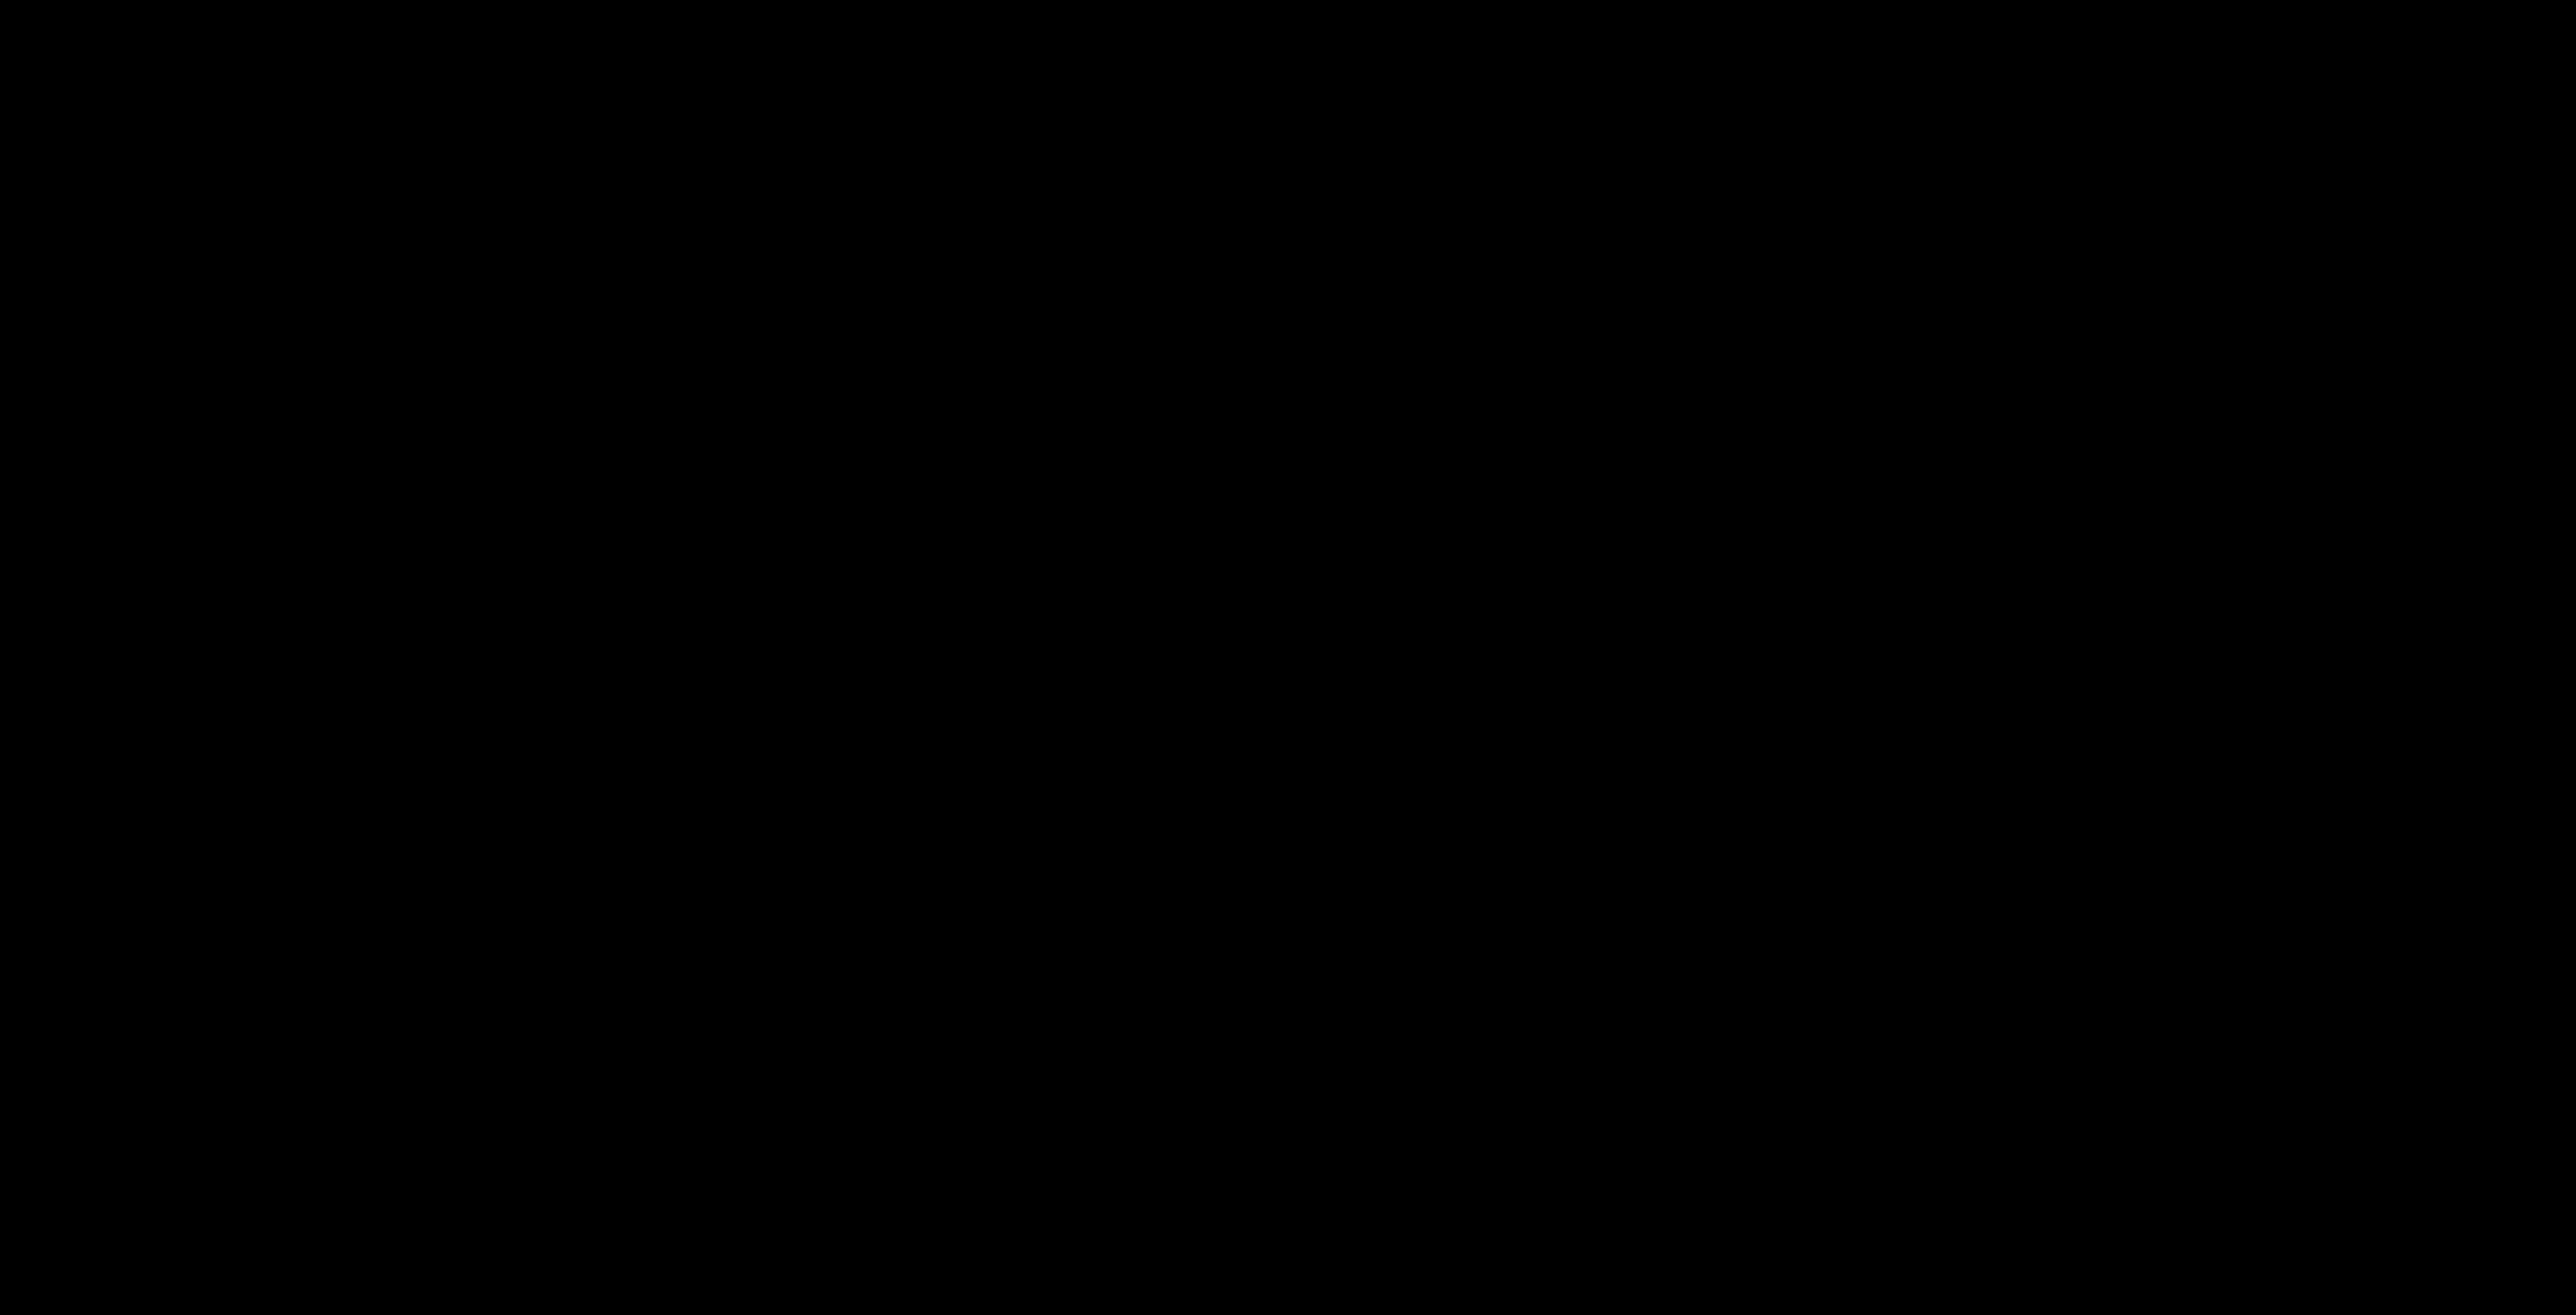 TM-610